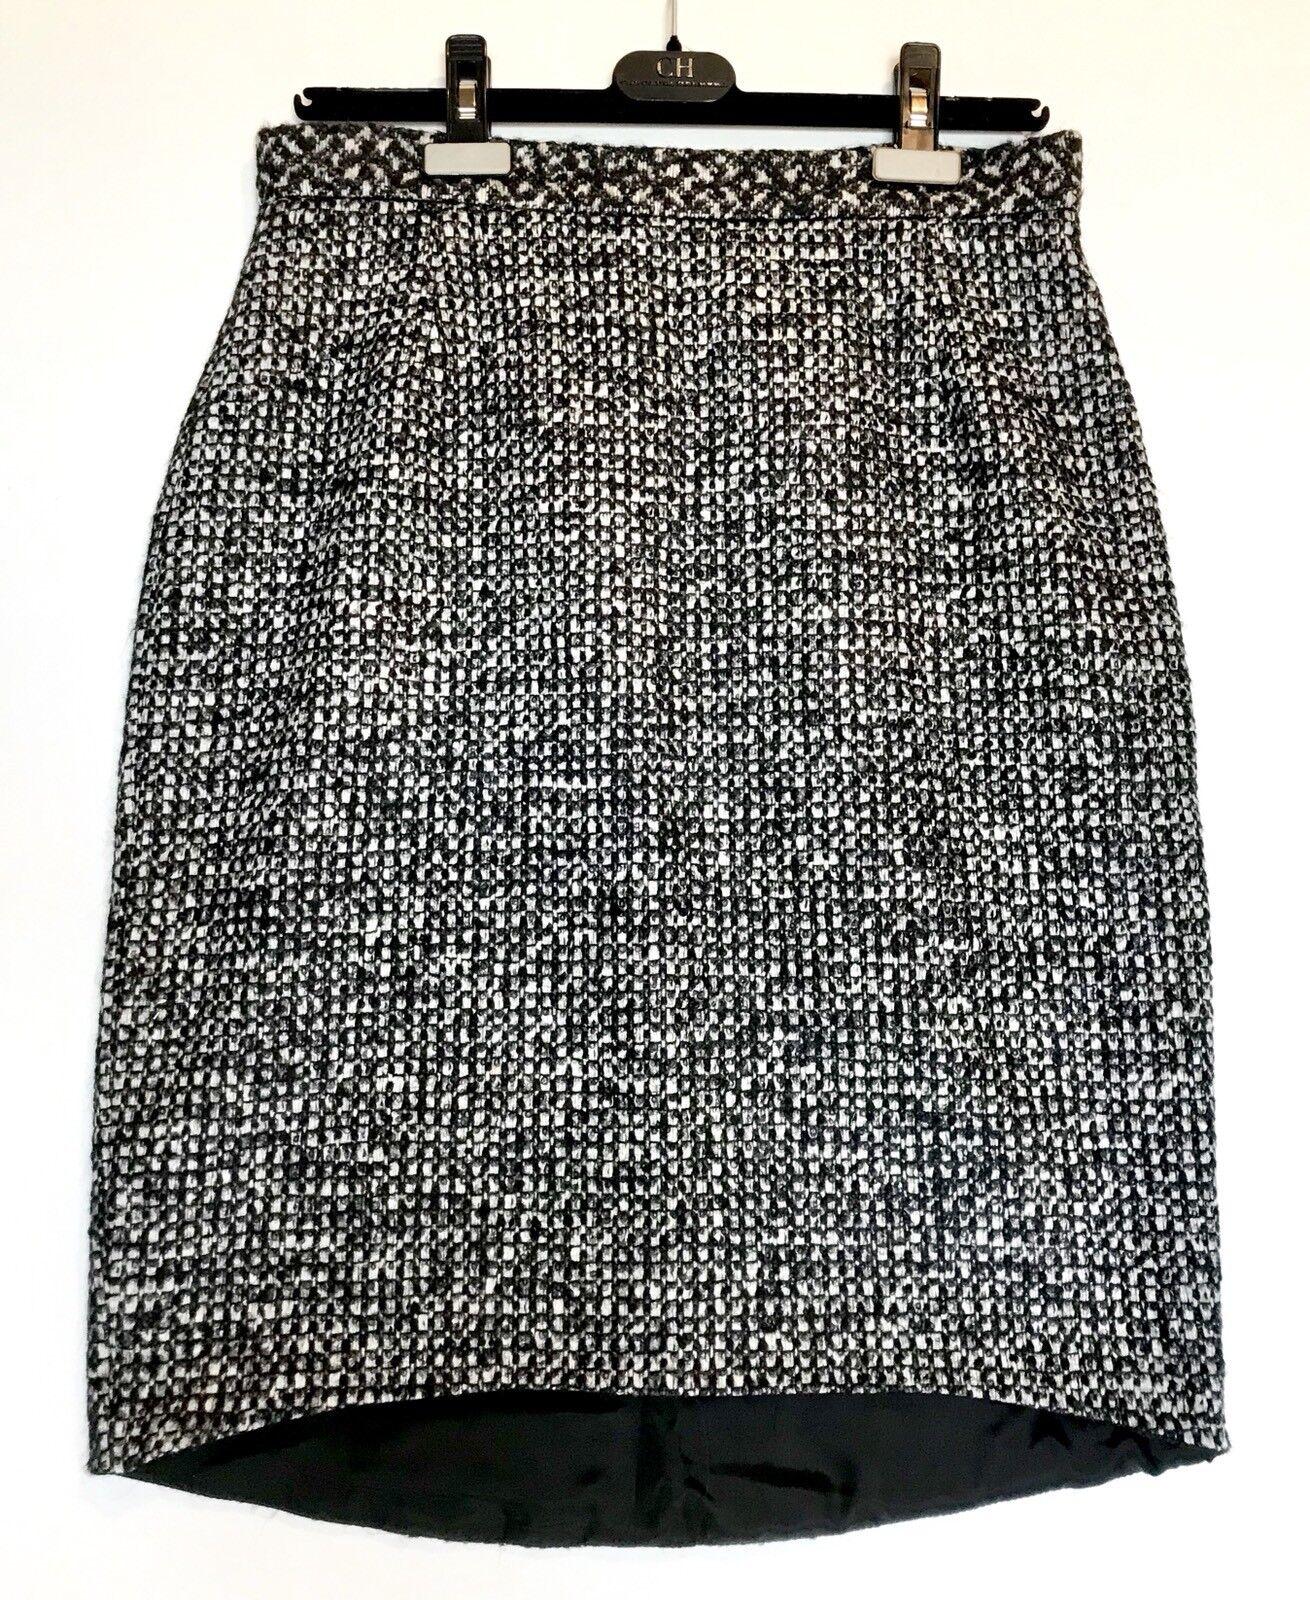 bilolina Herrera Tweed Wool Alpaca Mohair kjol NWT Detaljhandel  385 Price  195 Sz 8